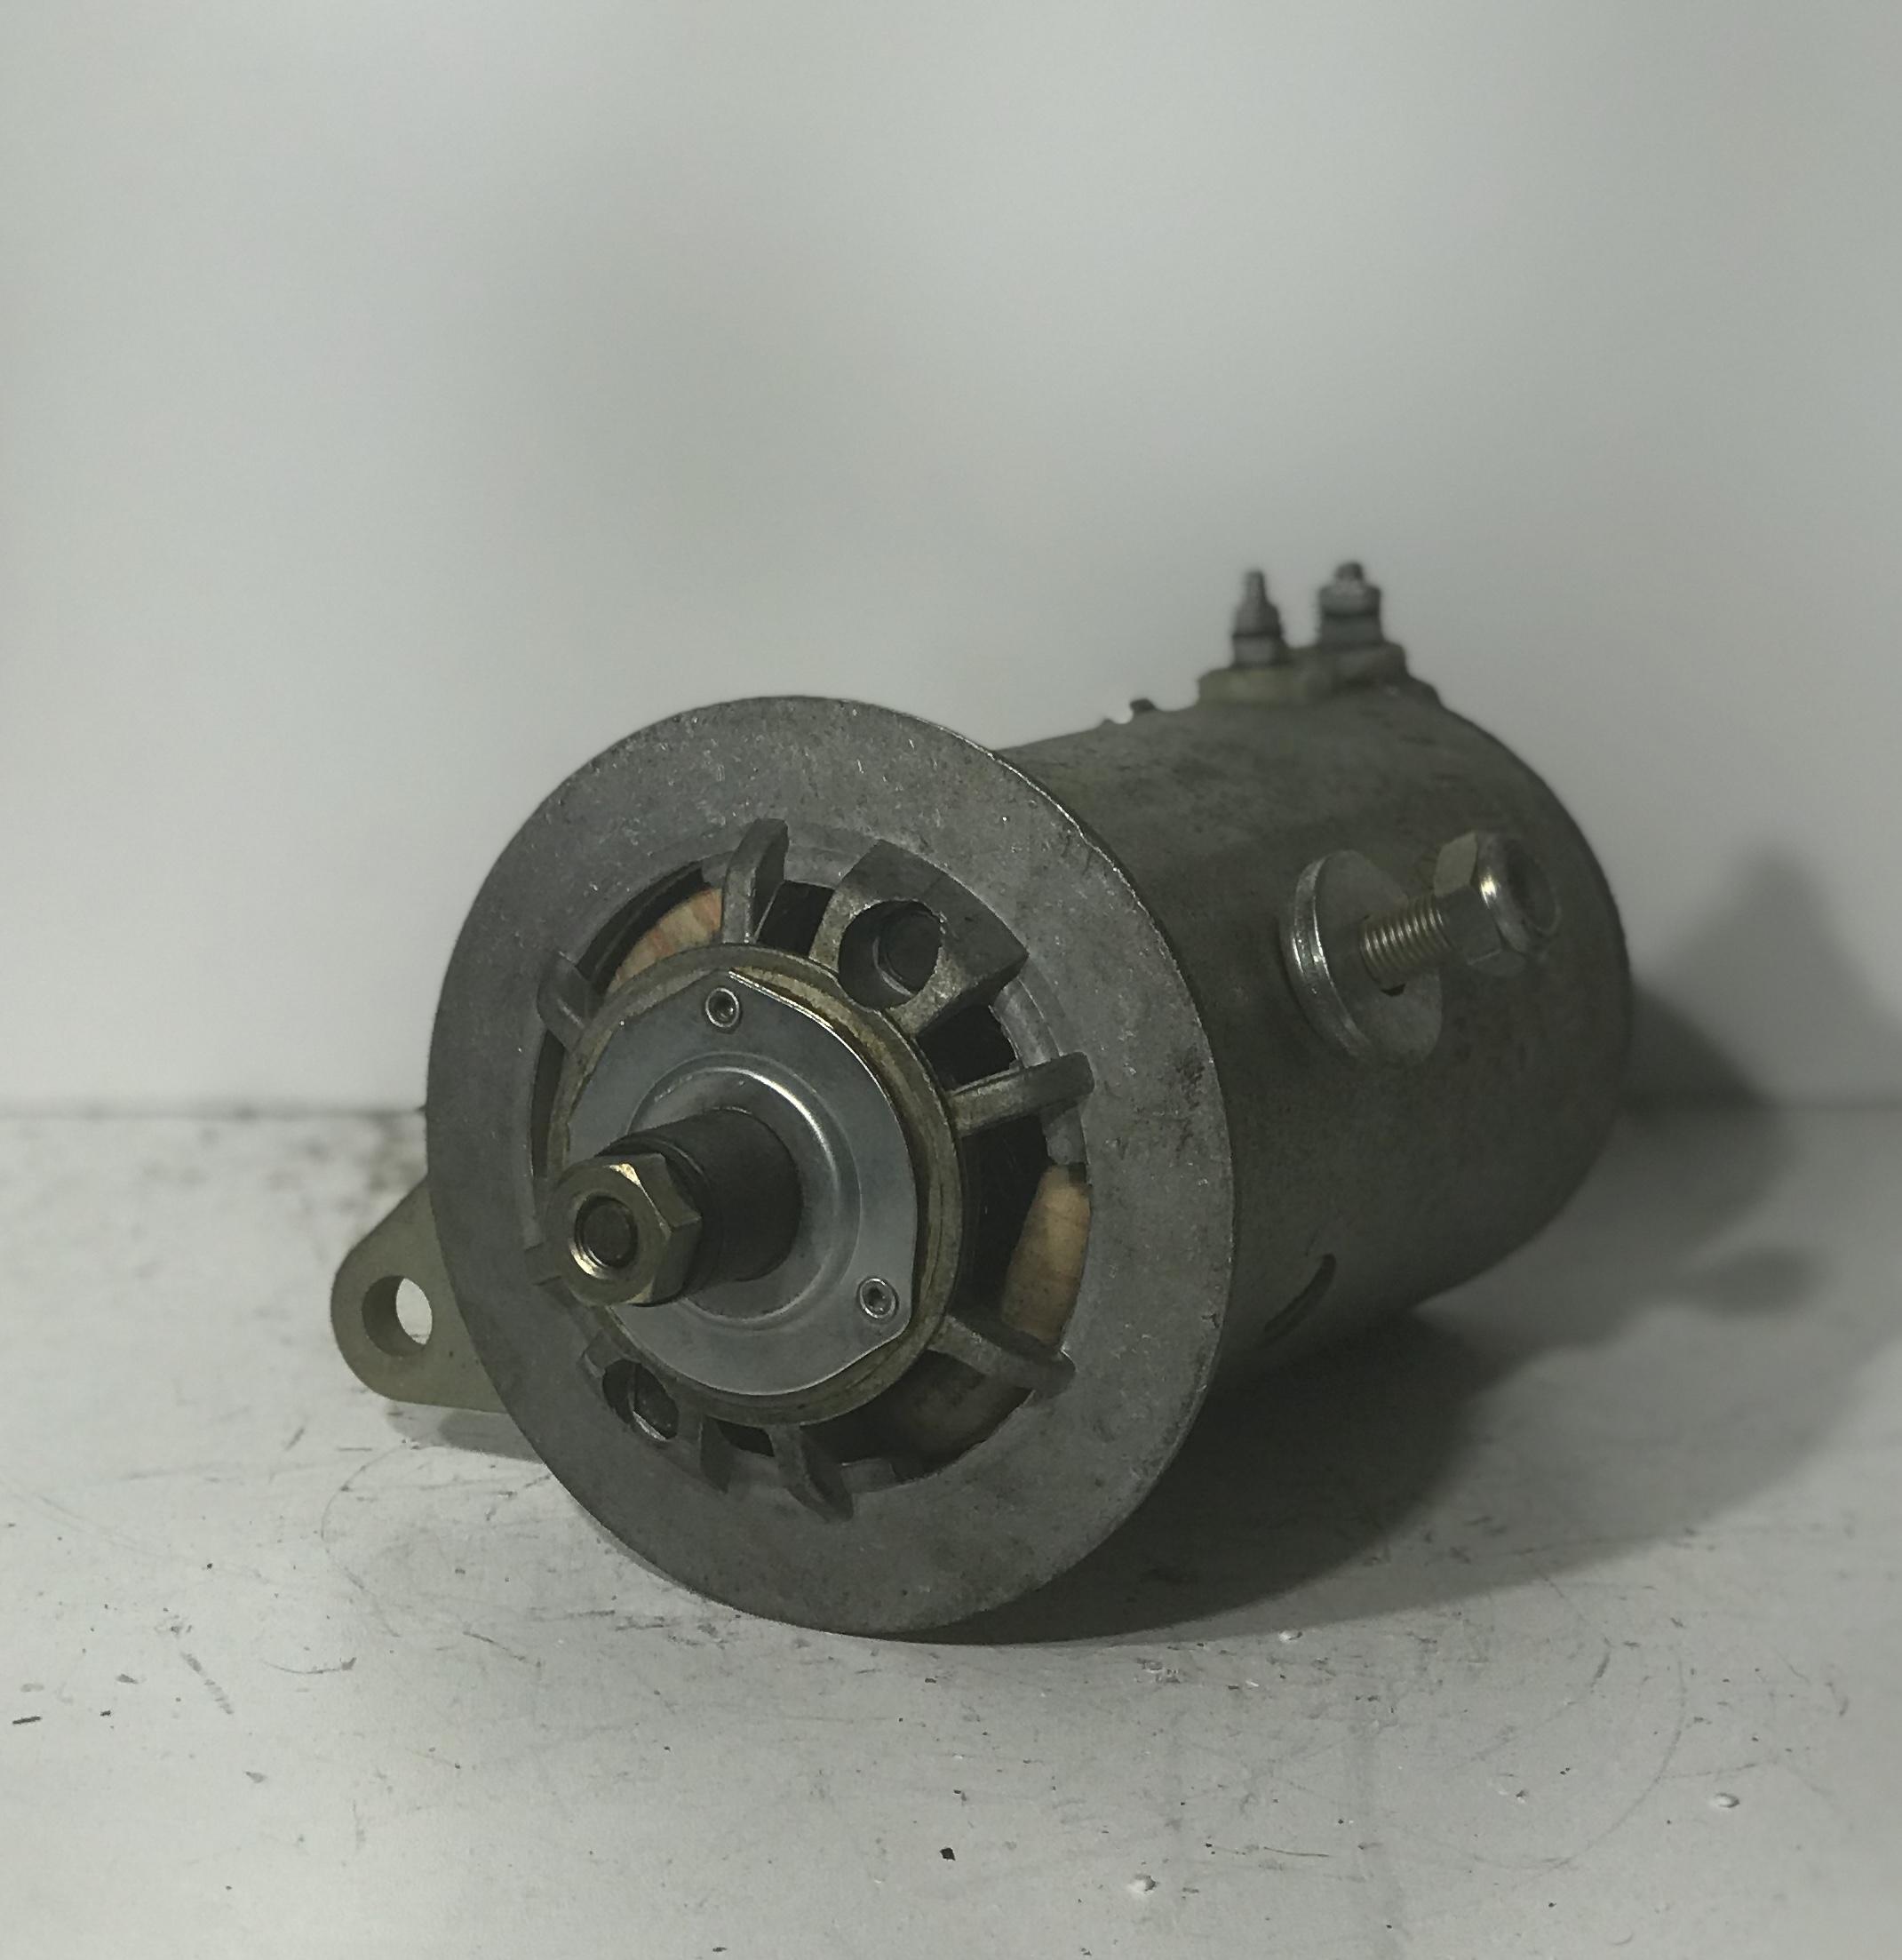 Femsa Gleichstromlichtmaschine DNE 12-4 12V/16A Generator ancre ancla anchor